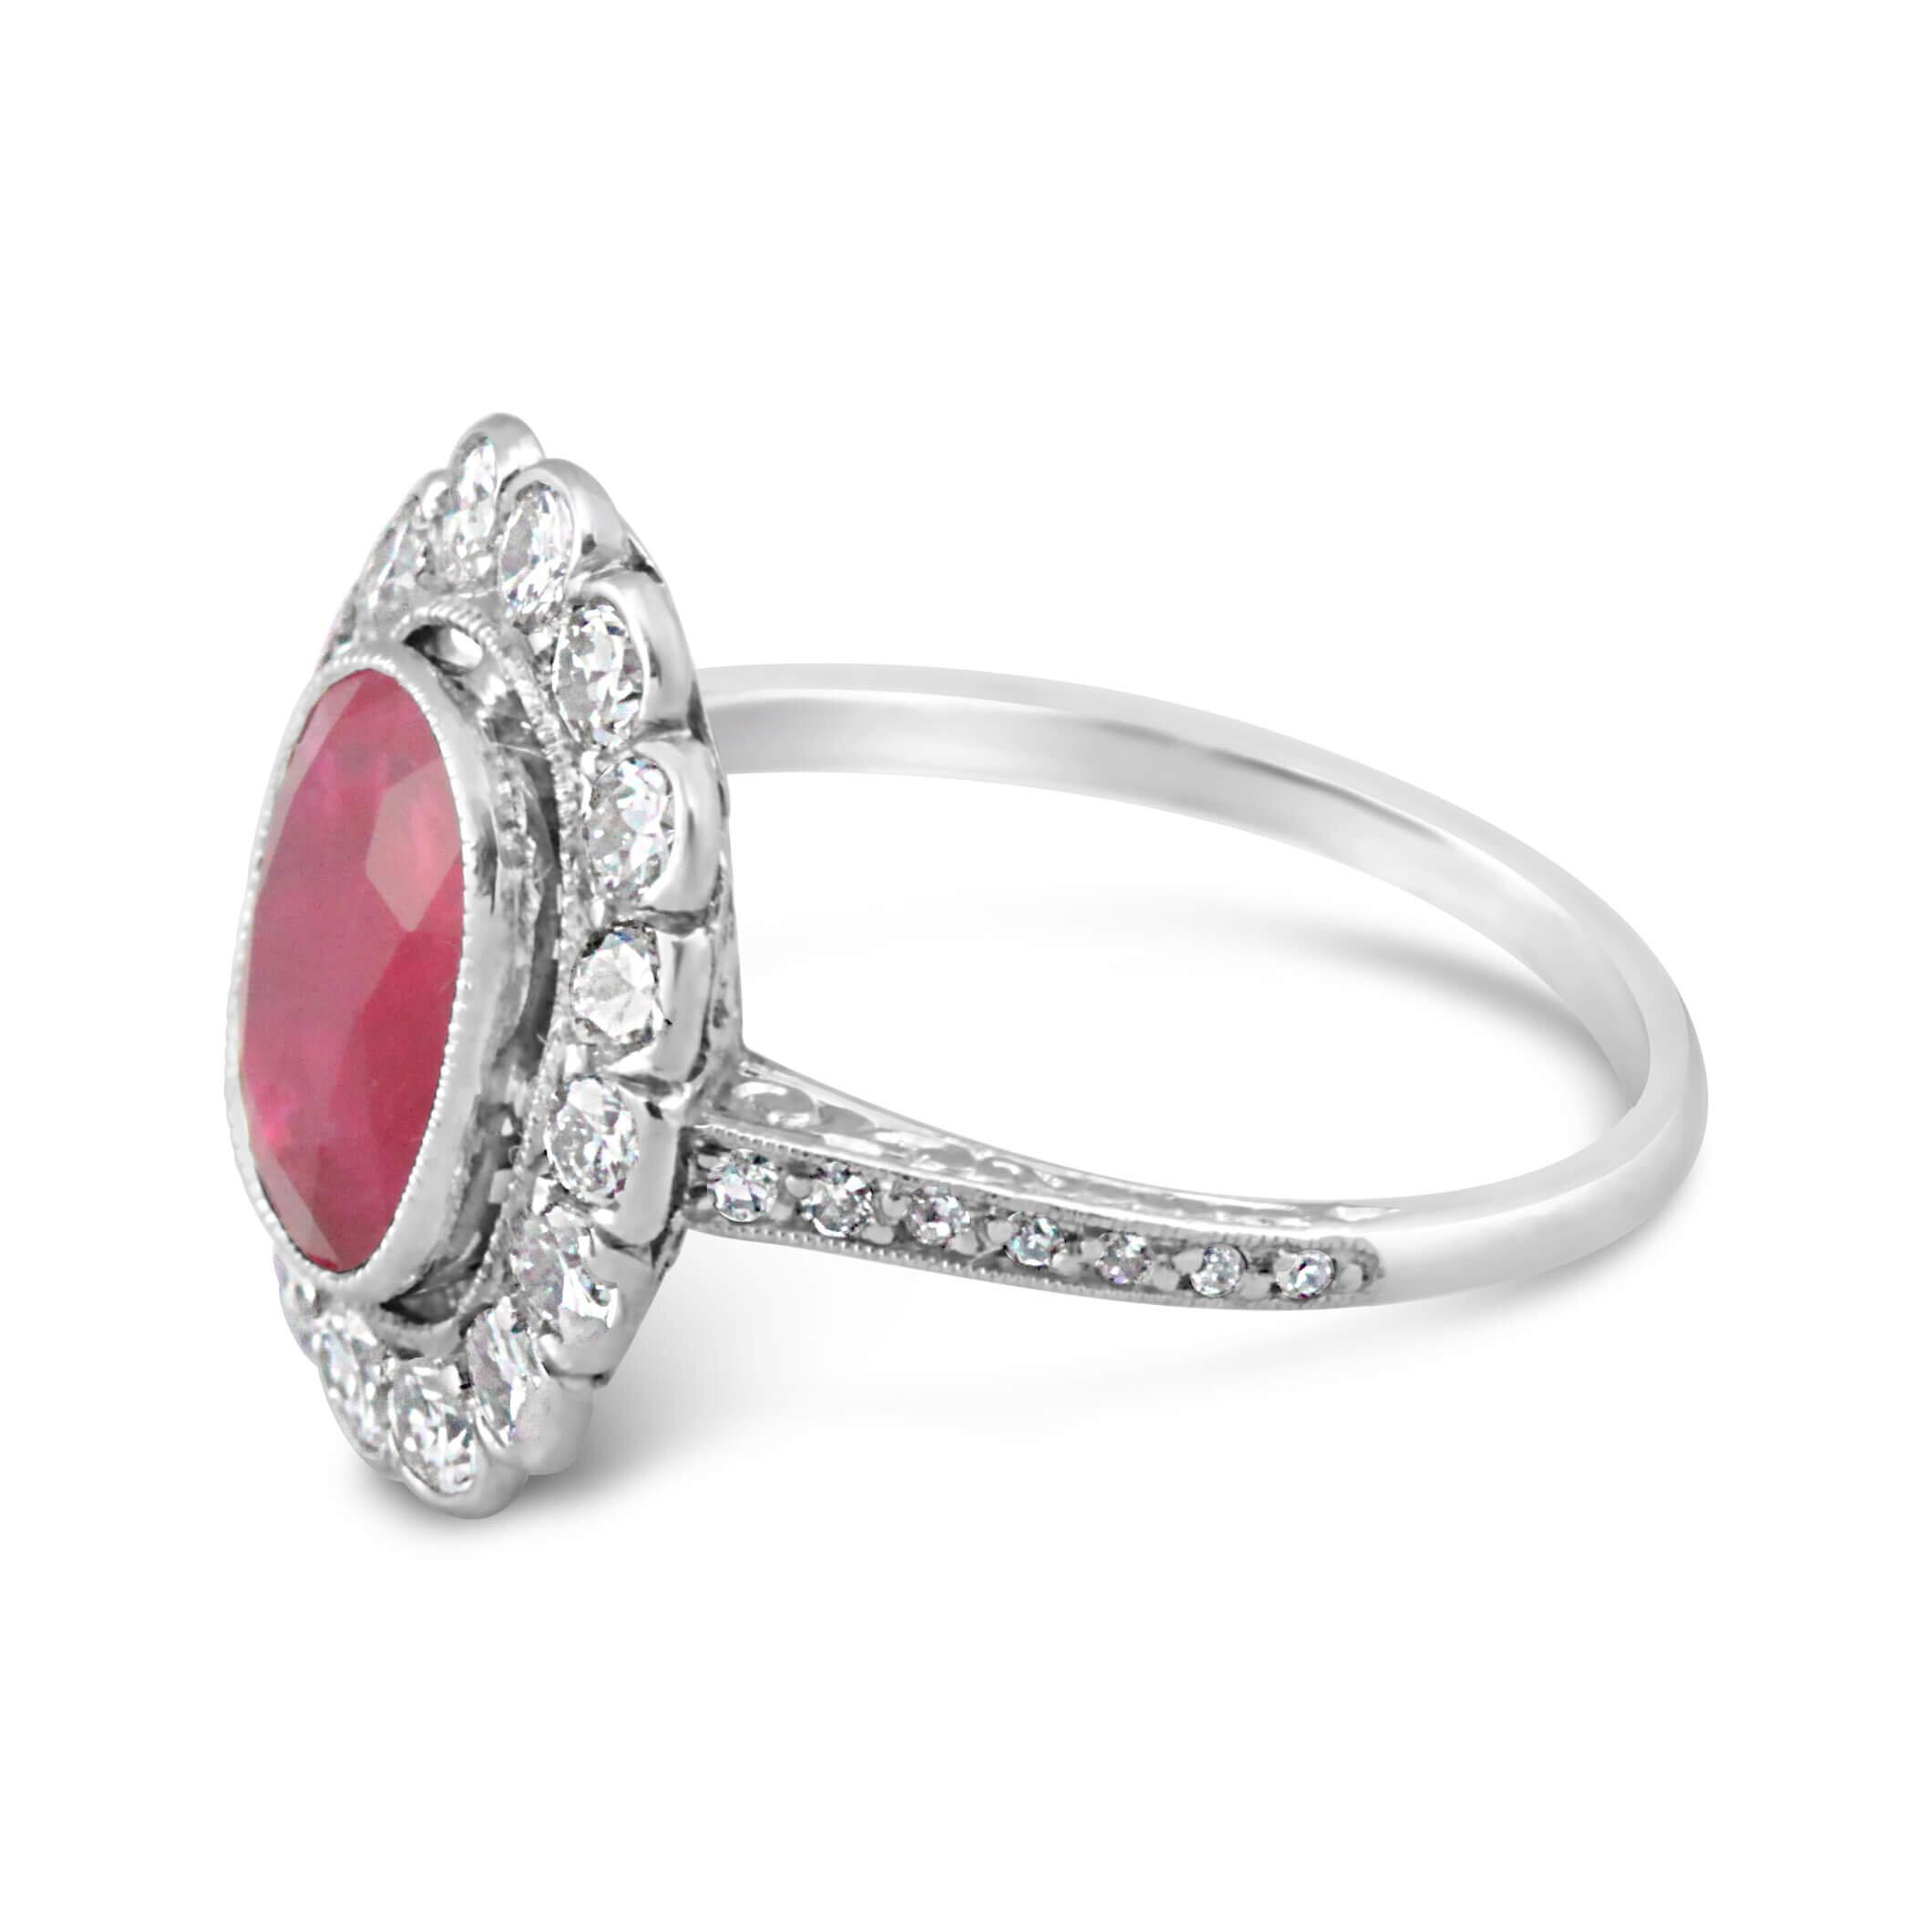 2 ct Unheated Burma Ruby Platinum Ring_side2.jpg